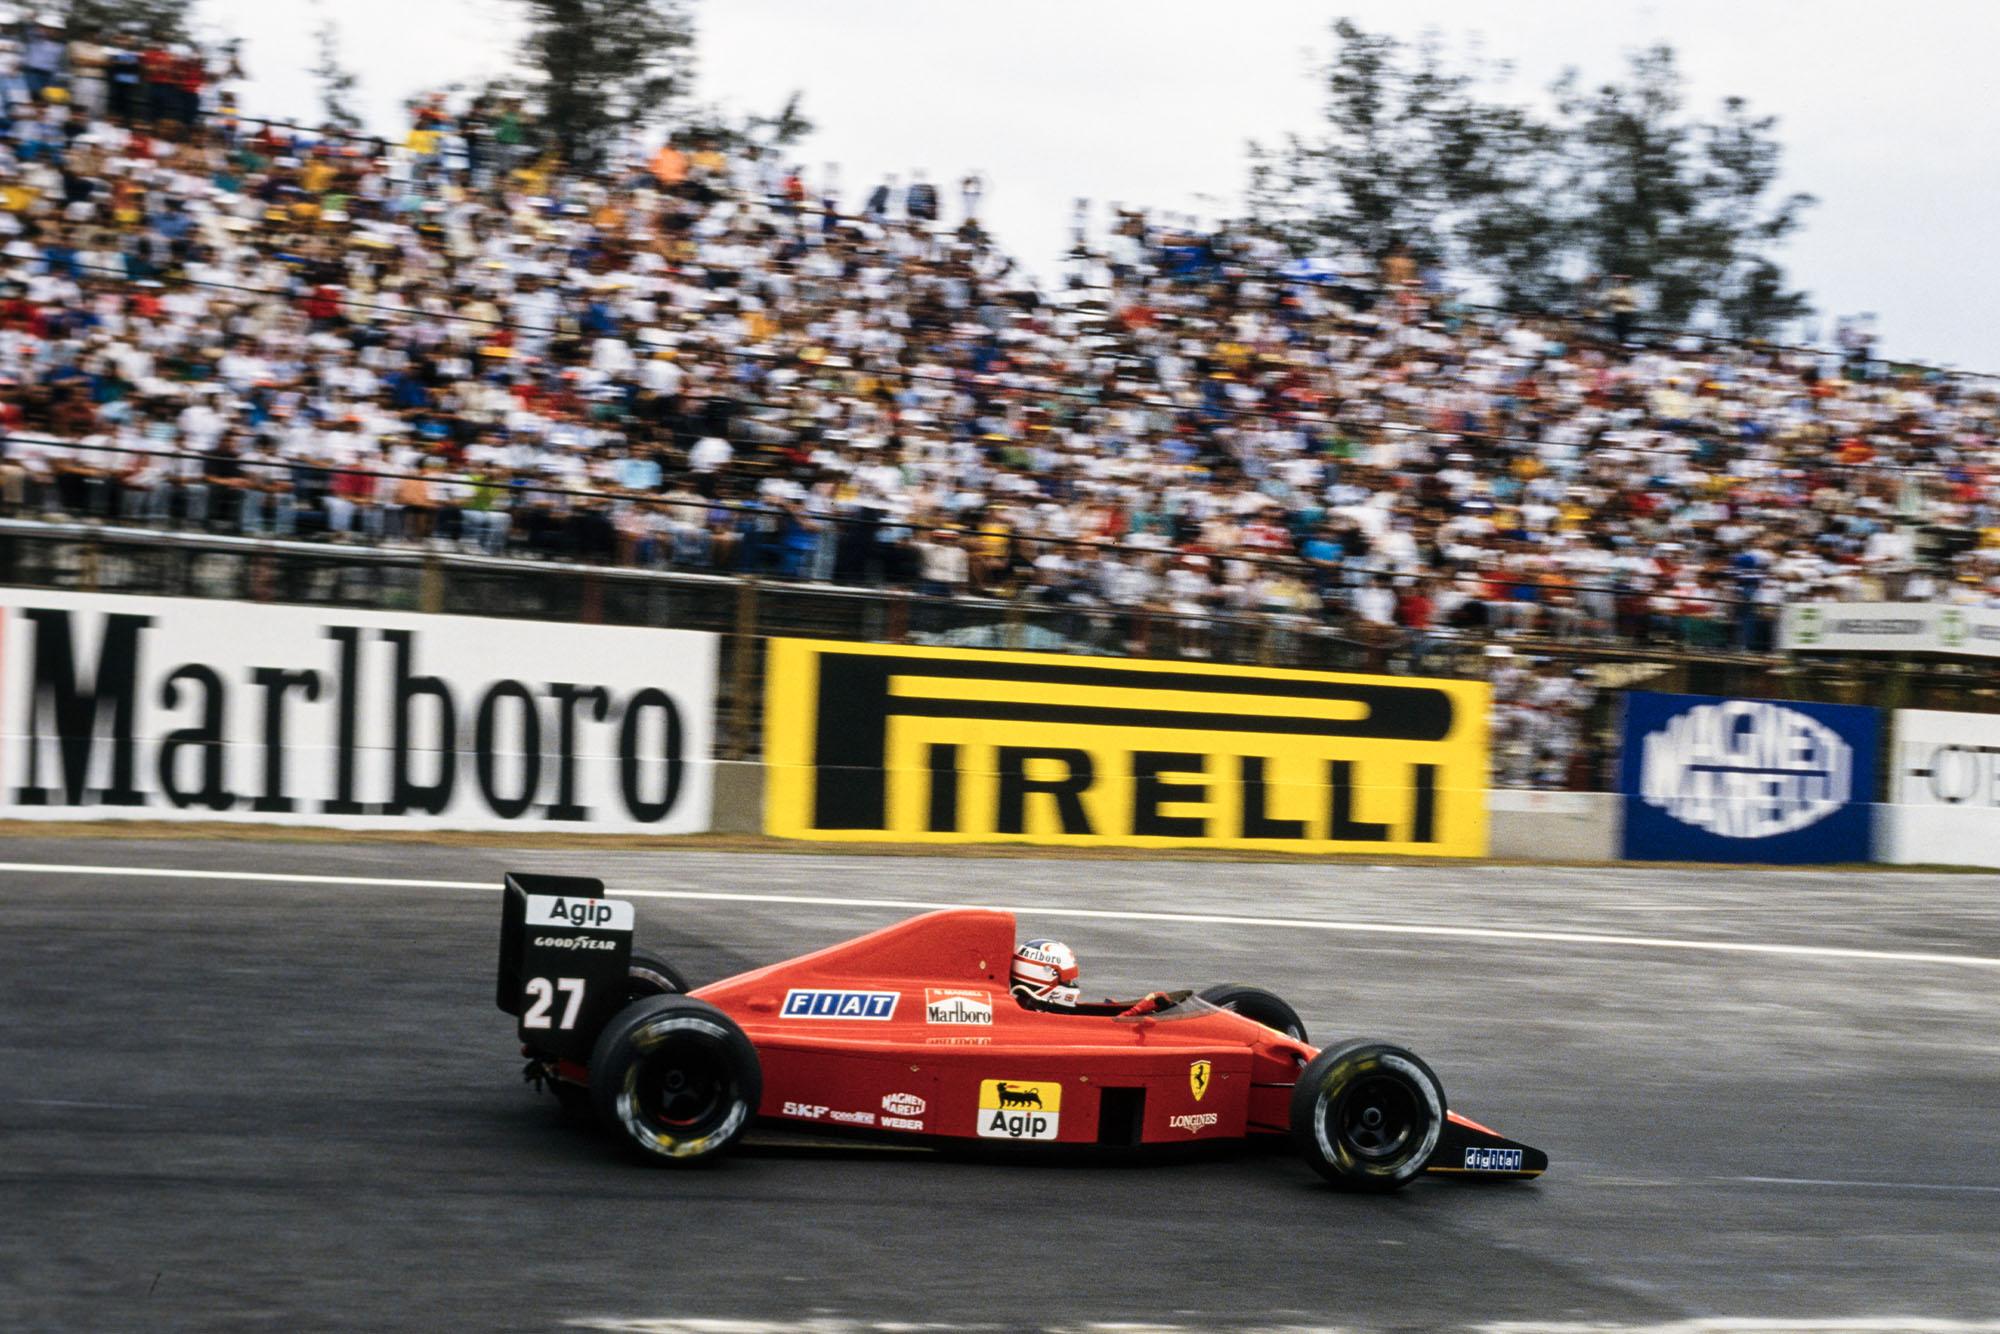 1989 Mex GP Mansell